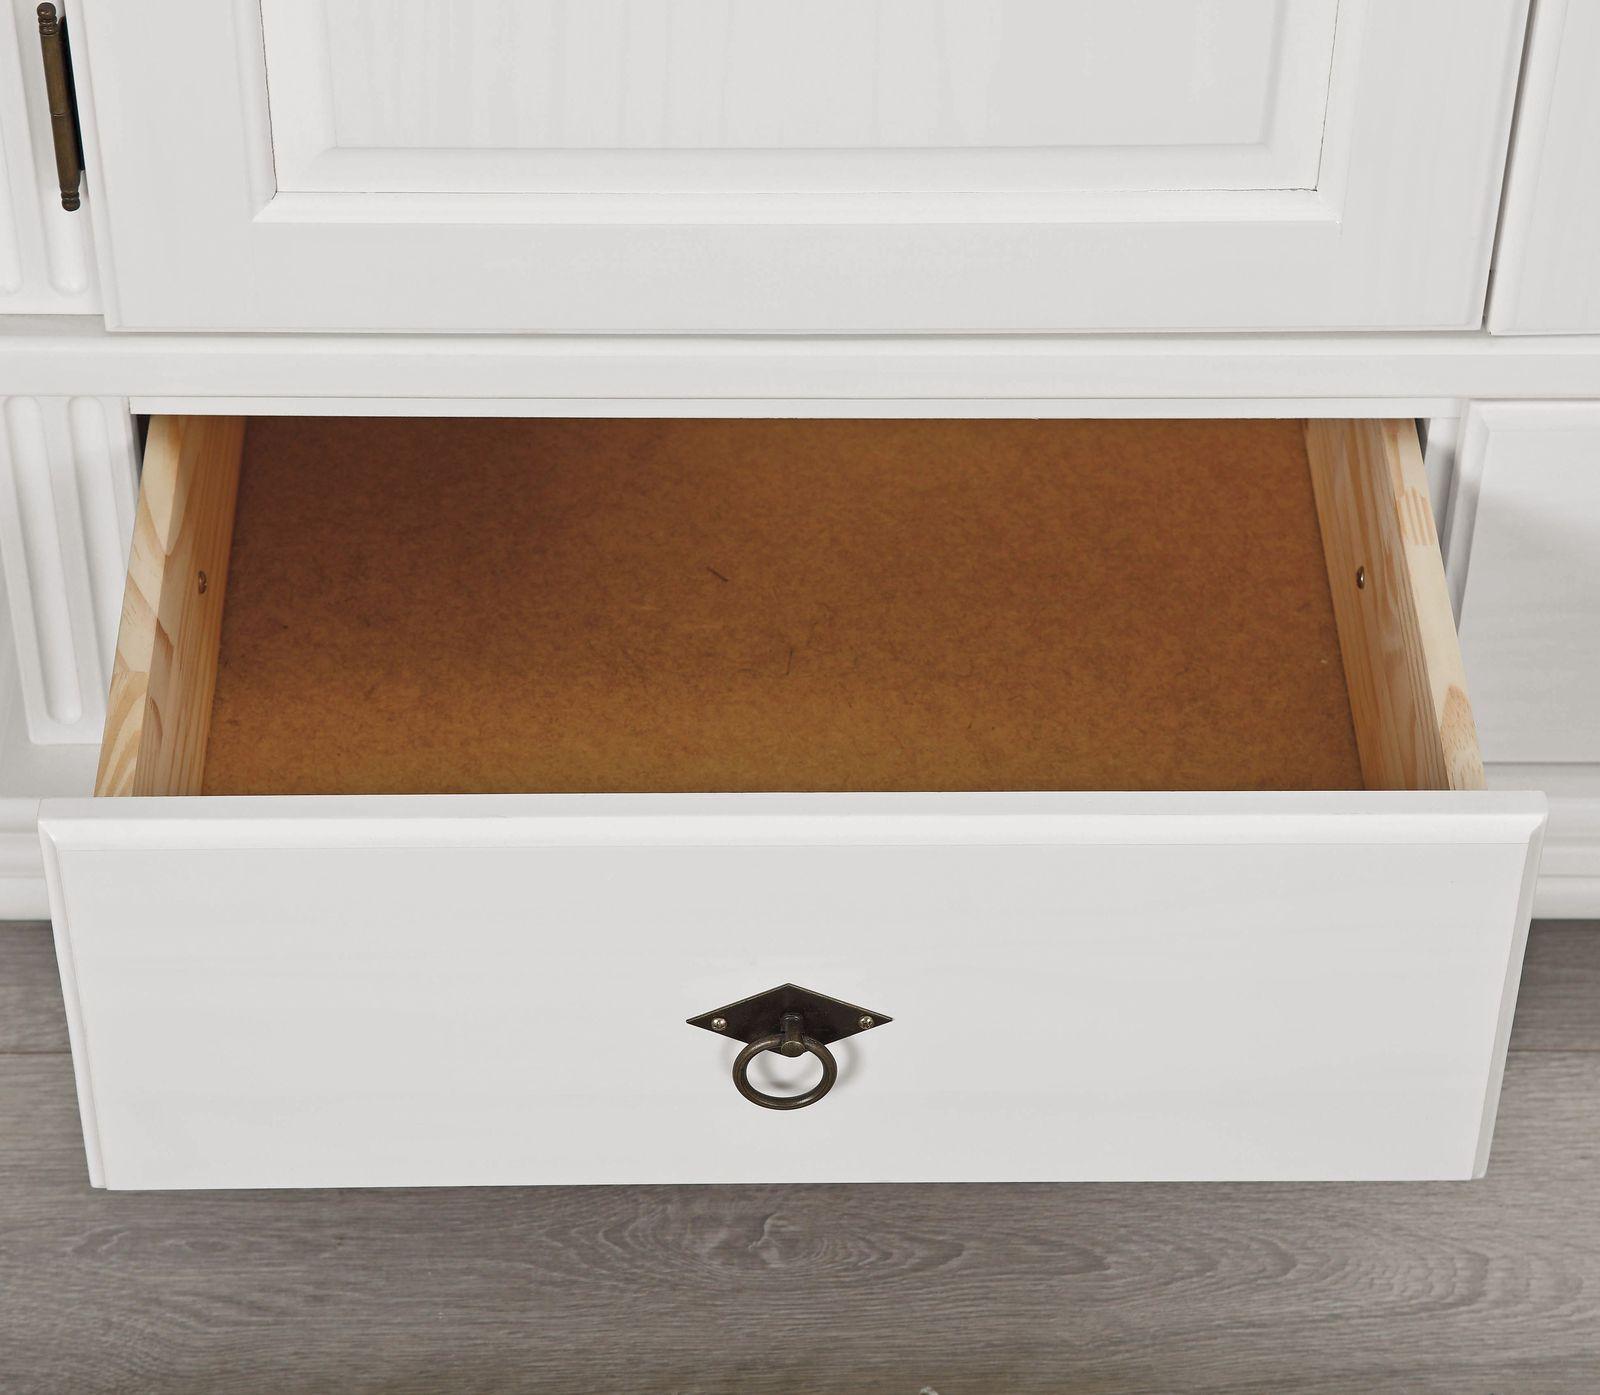 Wäscheschrank Landhausstil aus FSC®-zertifizierter Kiefer - Wien